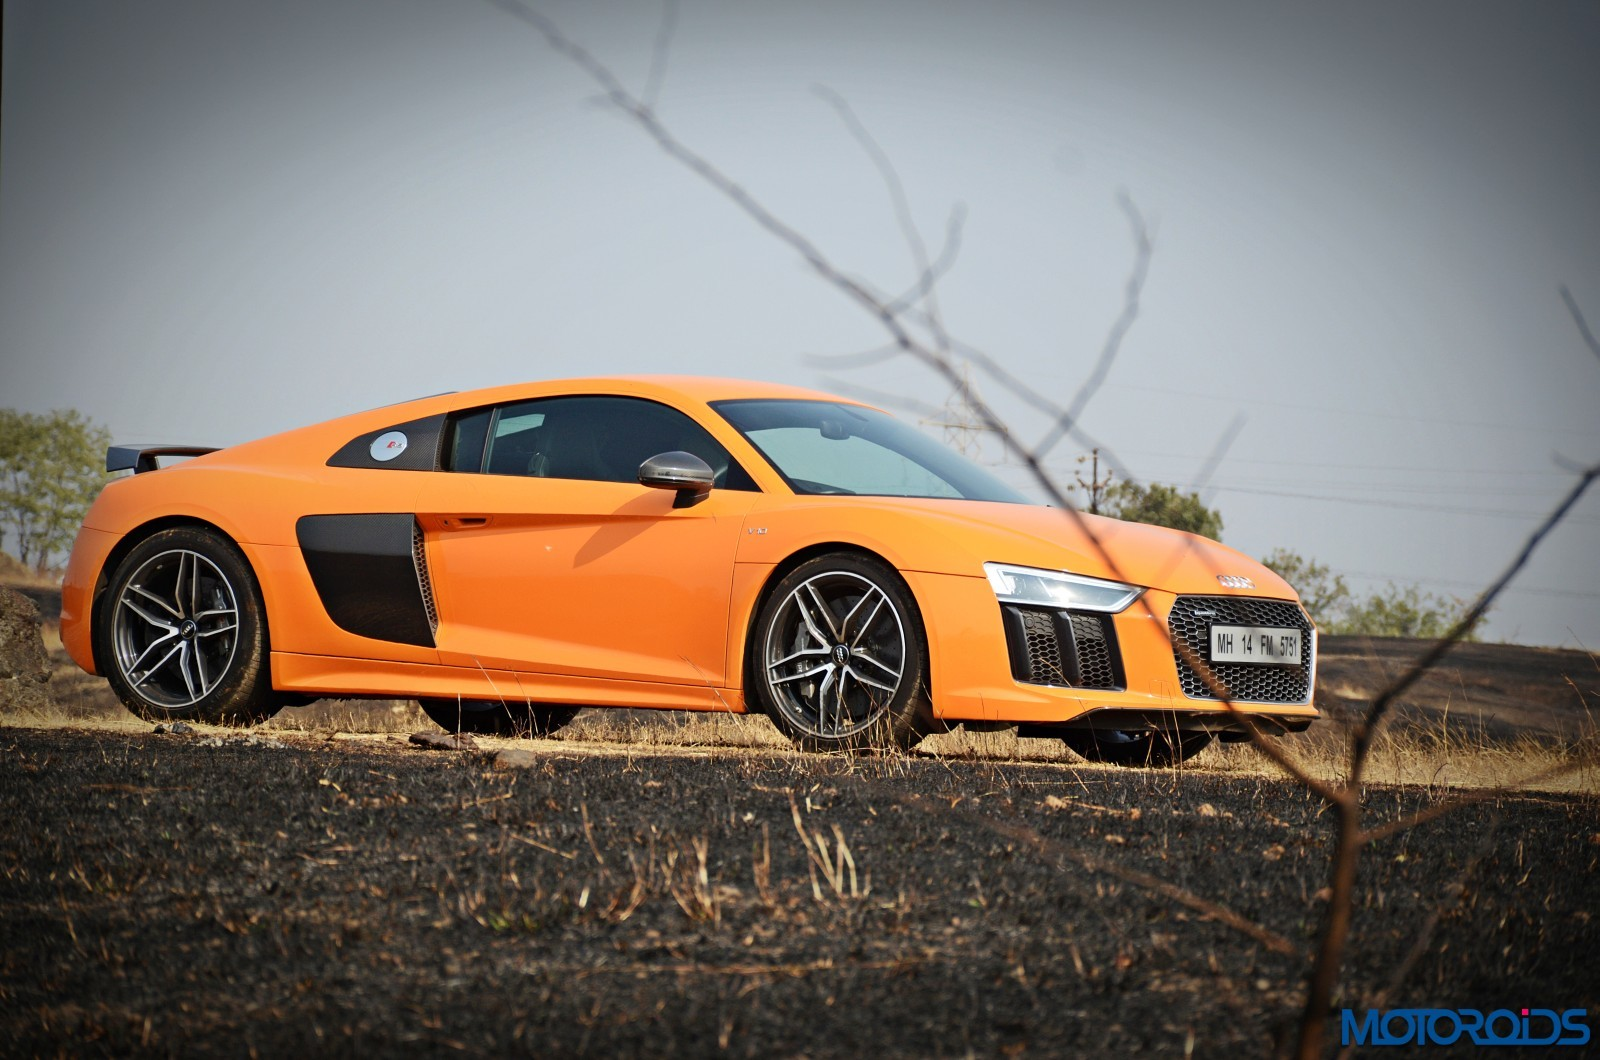 New-Audi-R8-V10-Plus-front-1